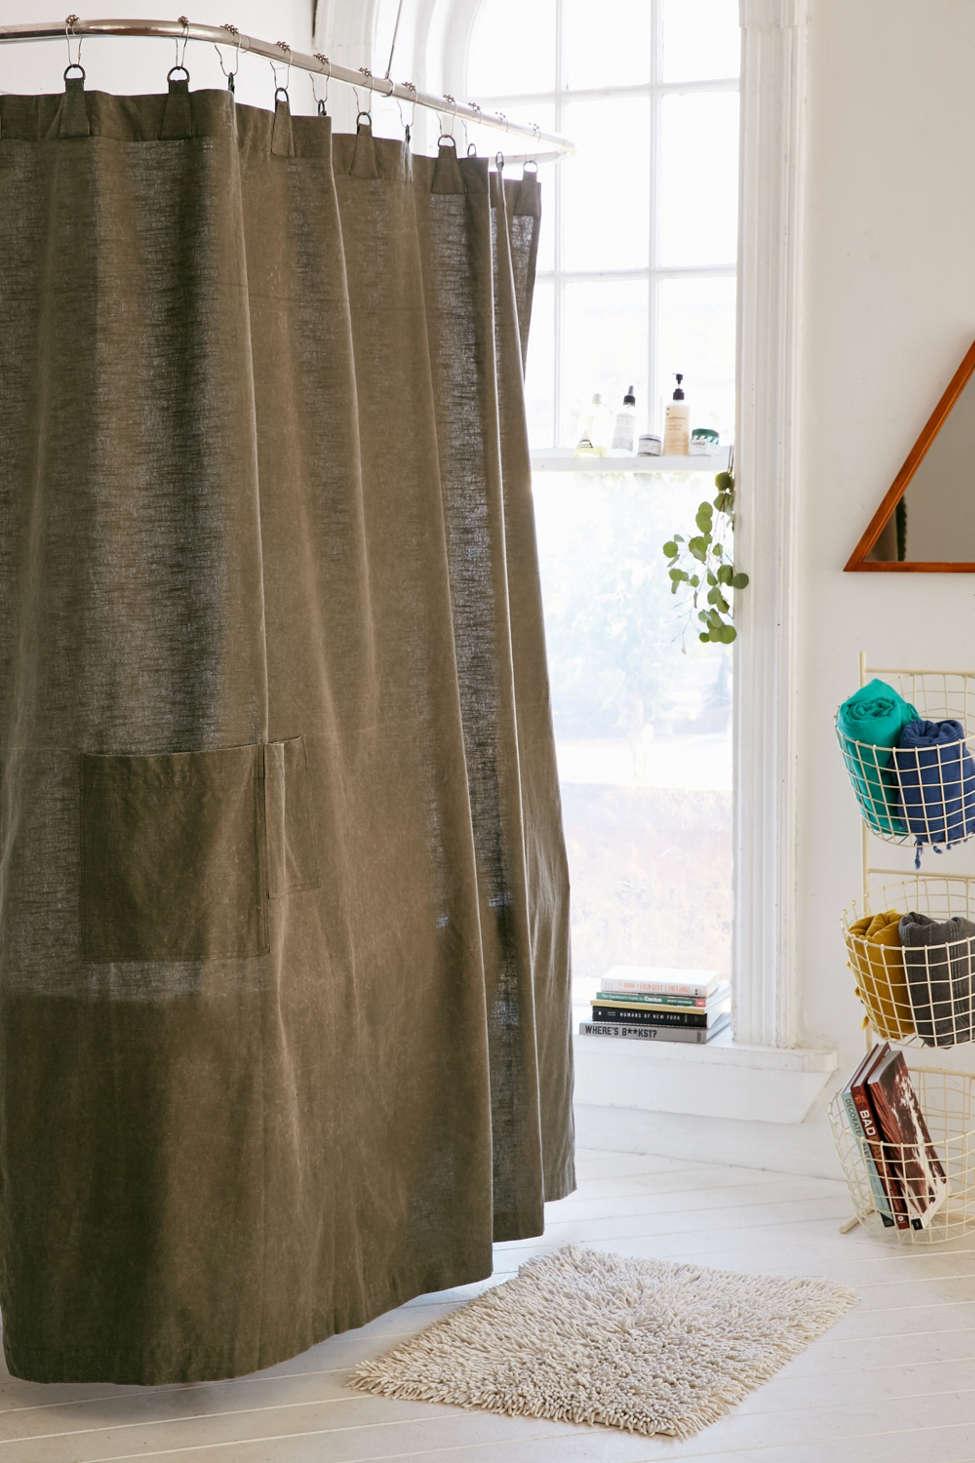 Slide View: 1: Surplus Shower Curtain